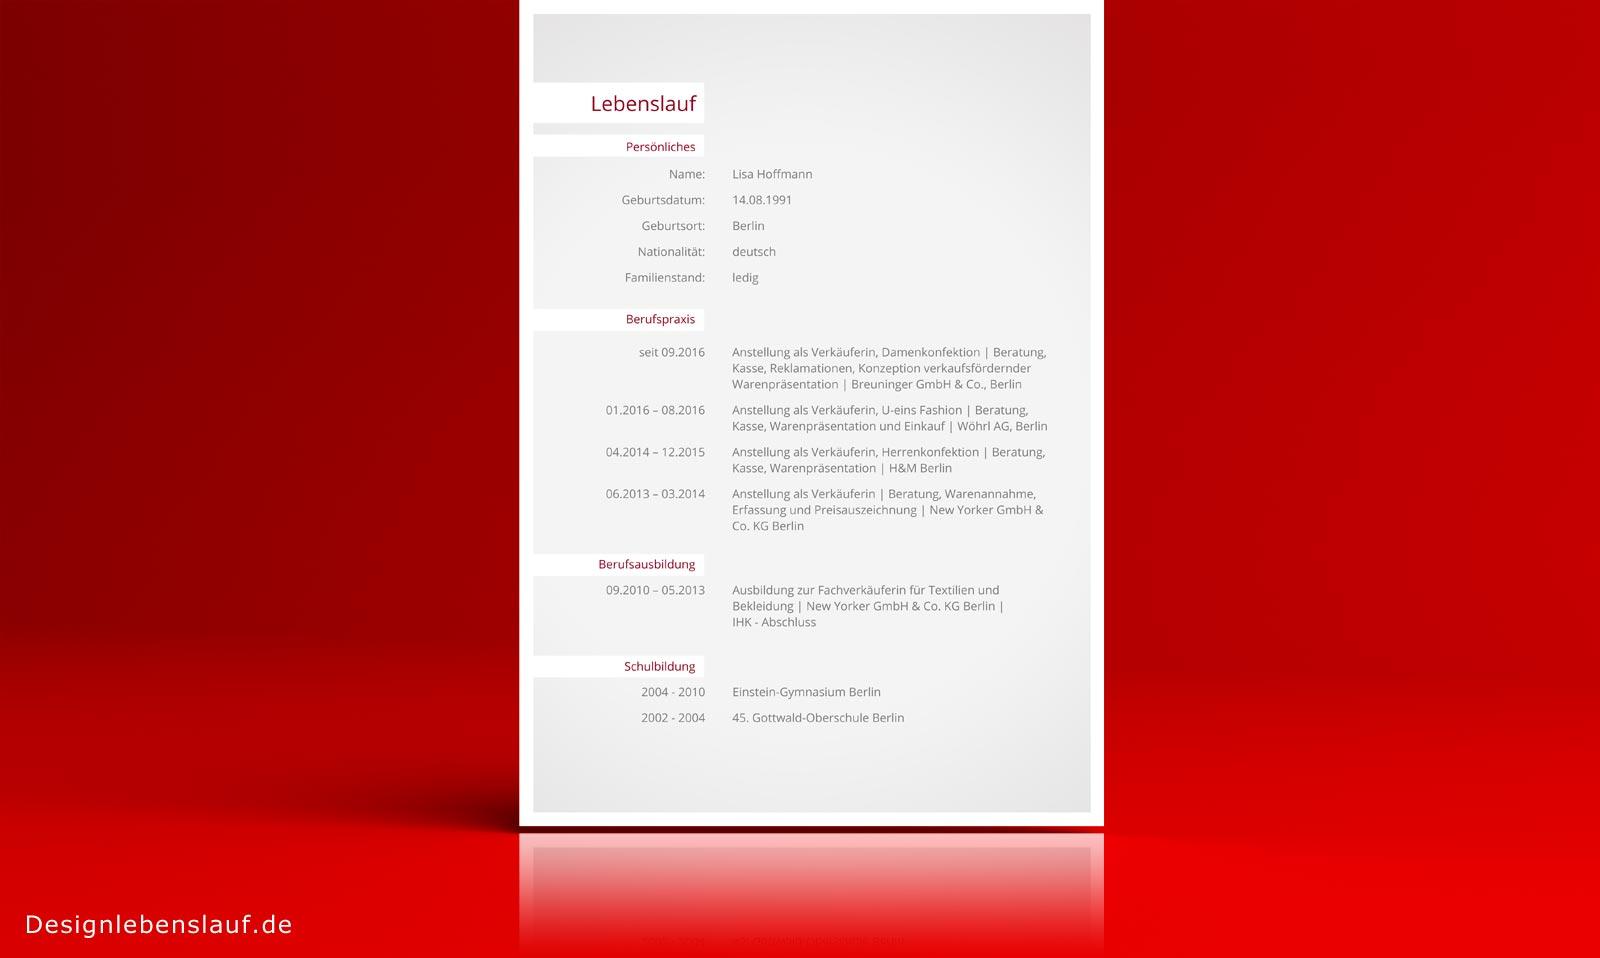 Tolle Aktuelle Lebenslaufbeispiele 2013 Ideen - Entry Level Resume ...